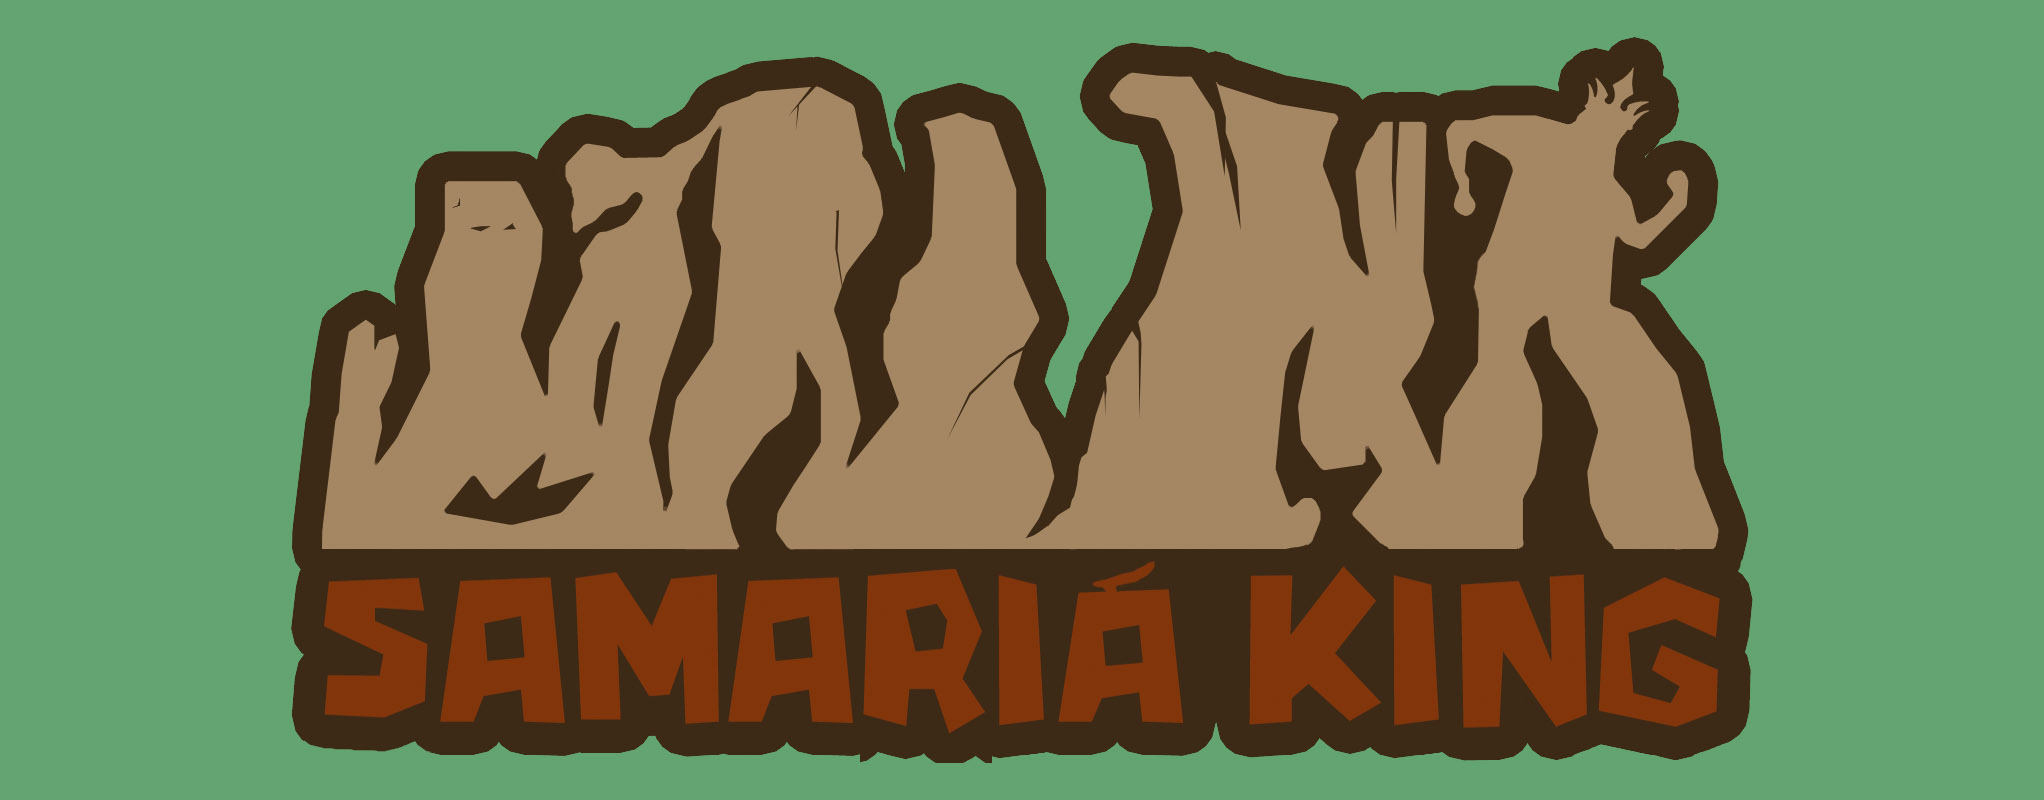 Samariá King